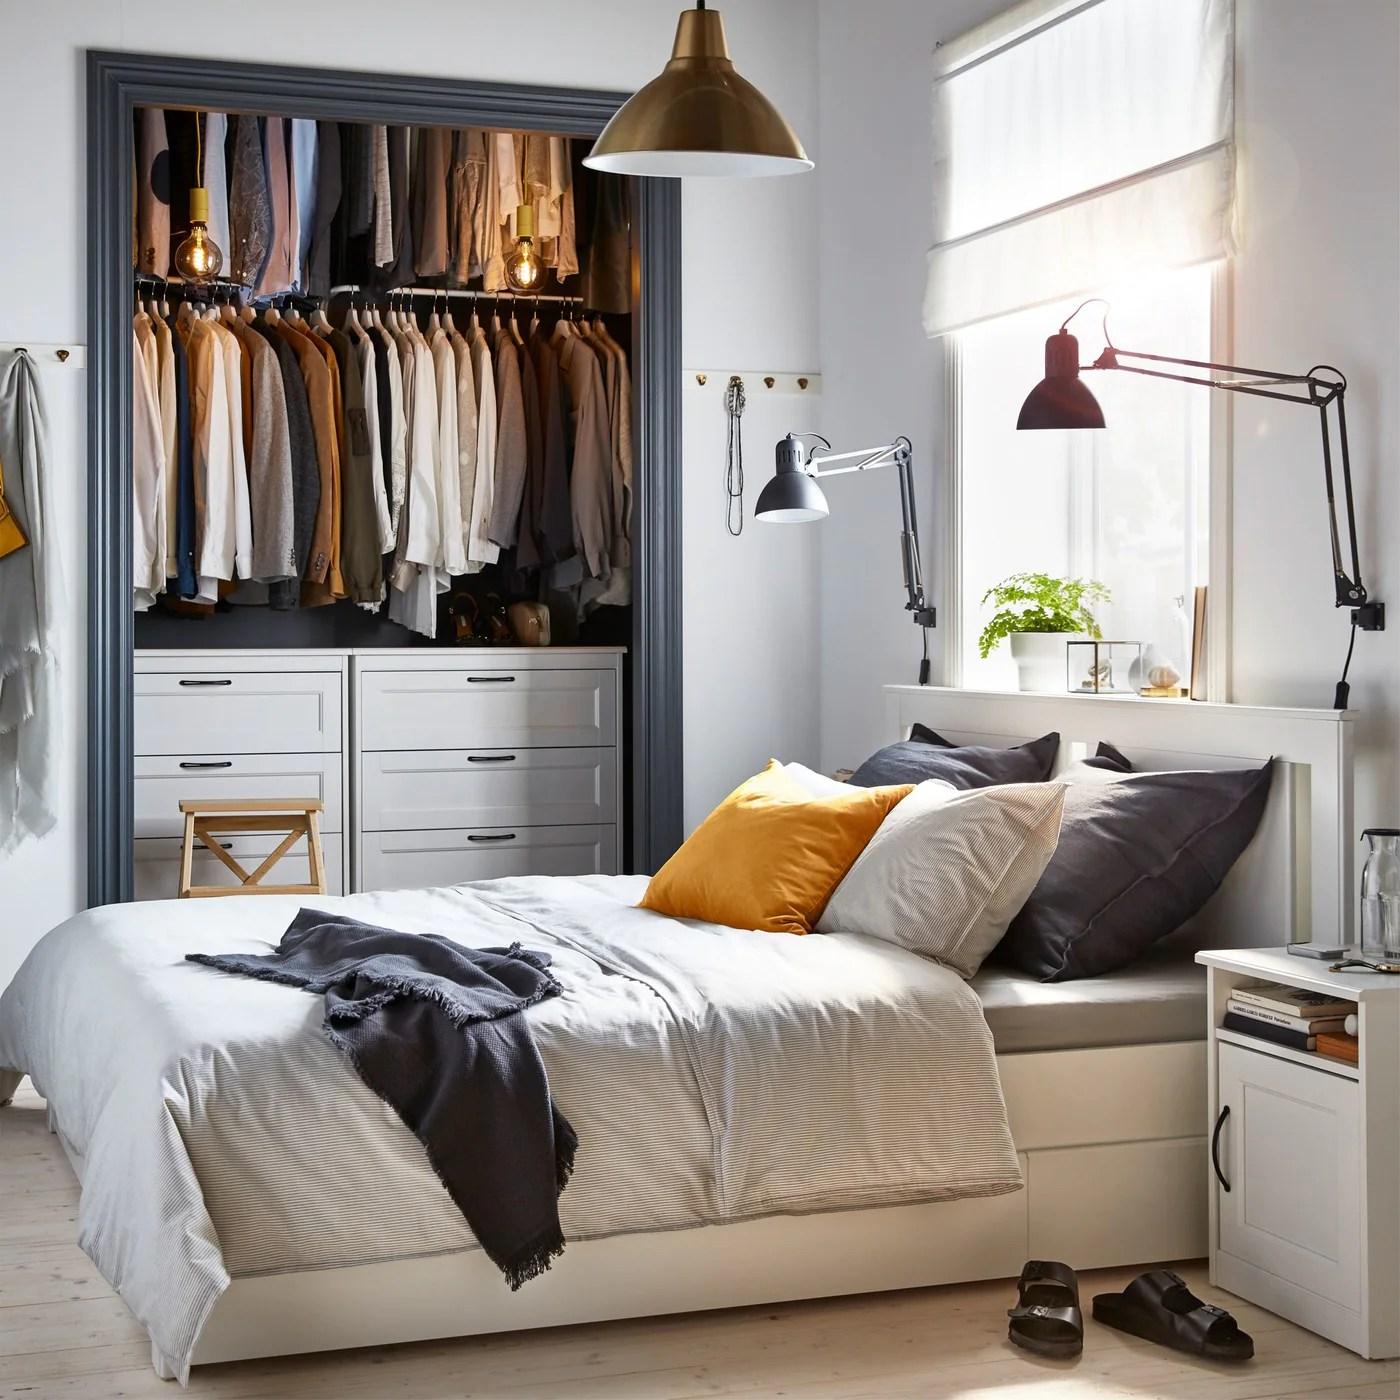 Bedroom Furniture Inspiration Online  IKEA UAE  IKEA